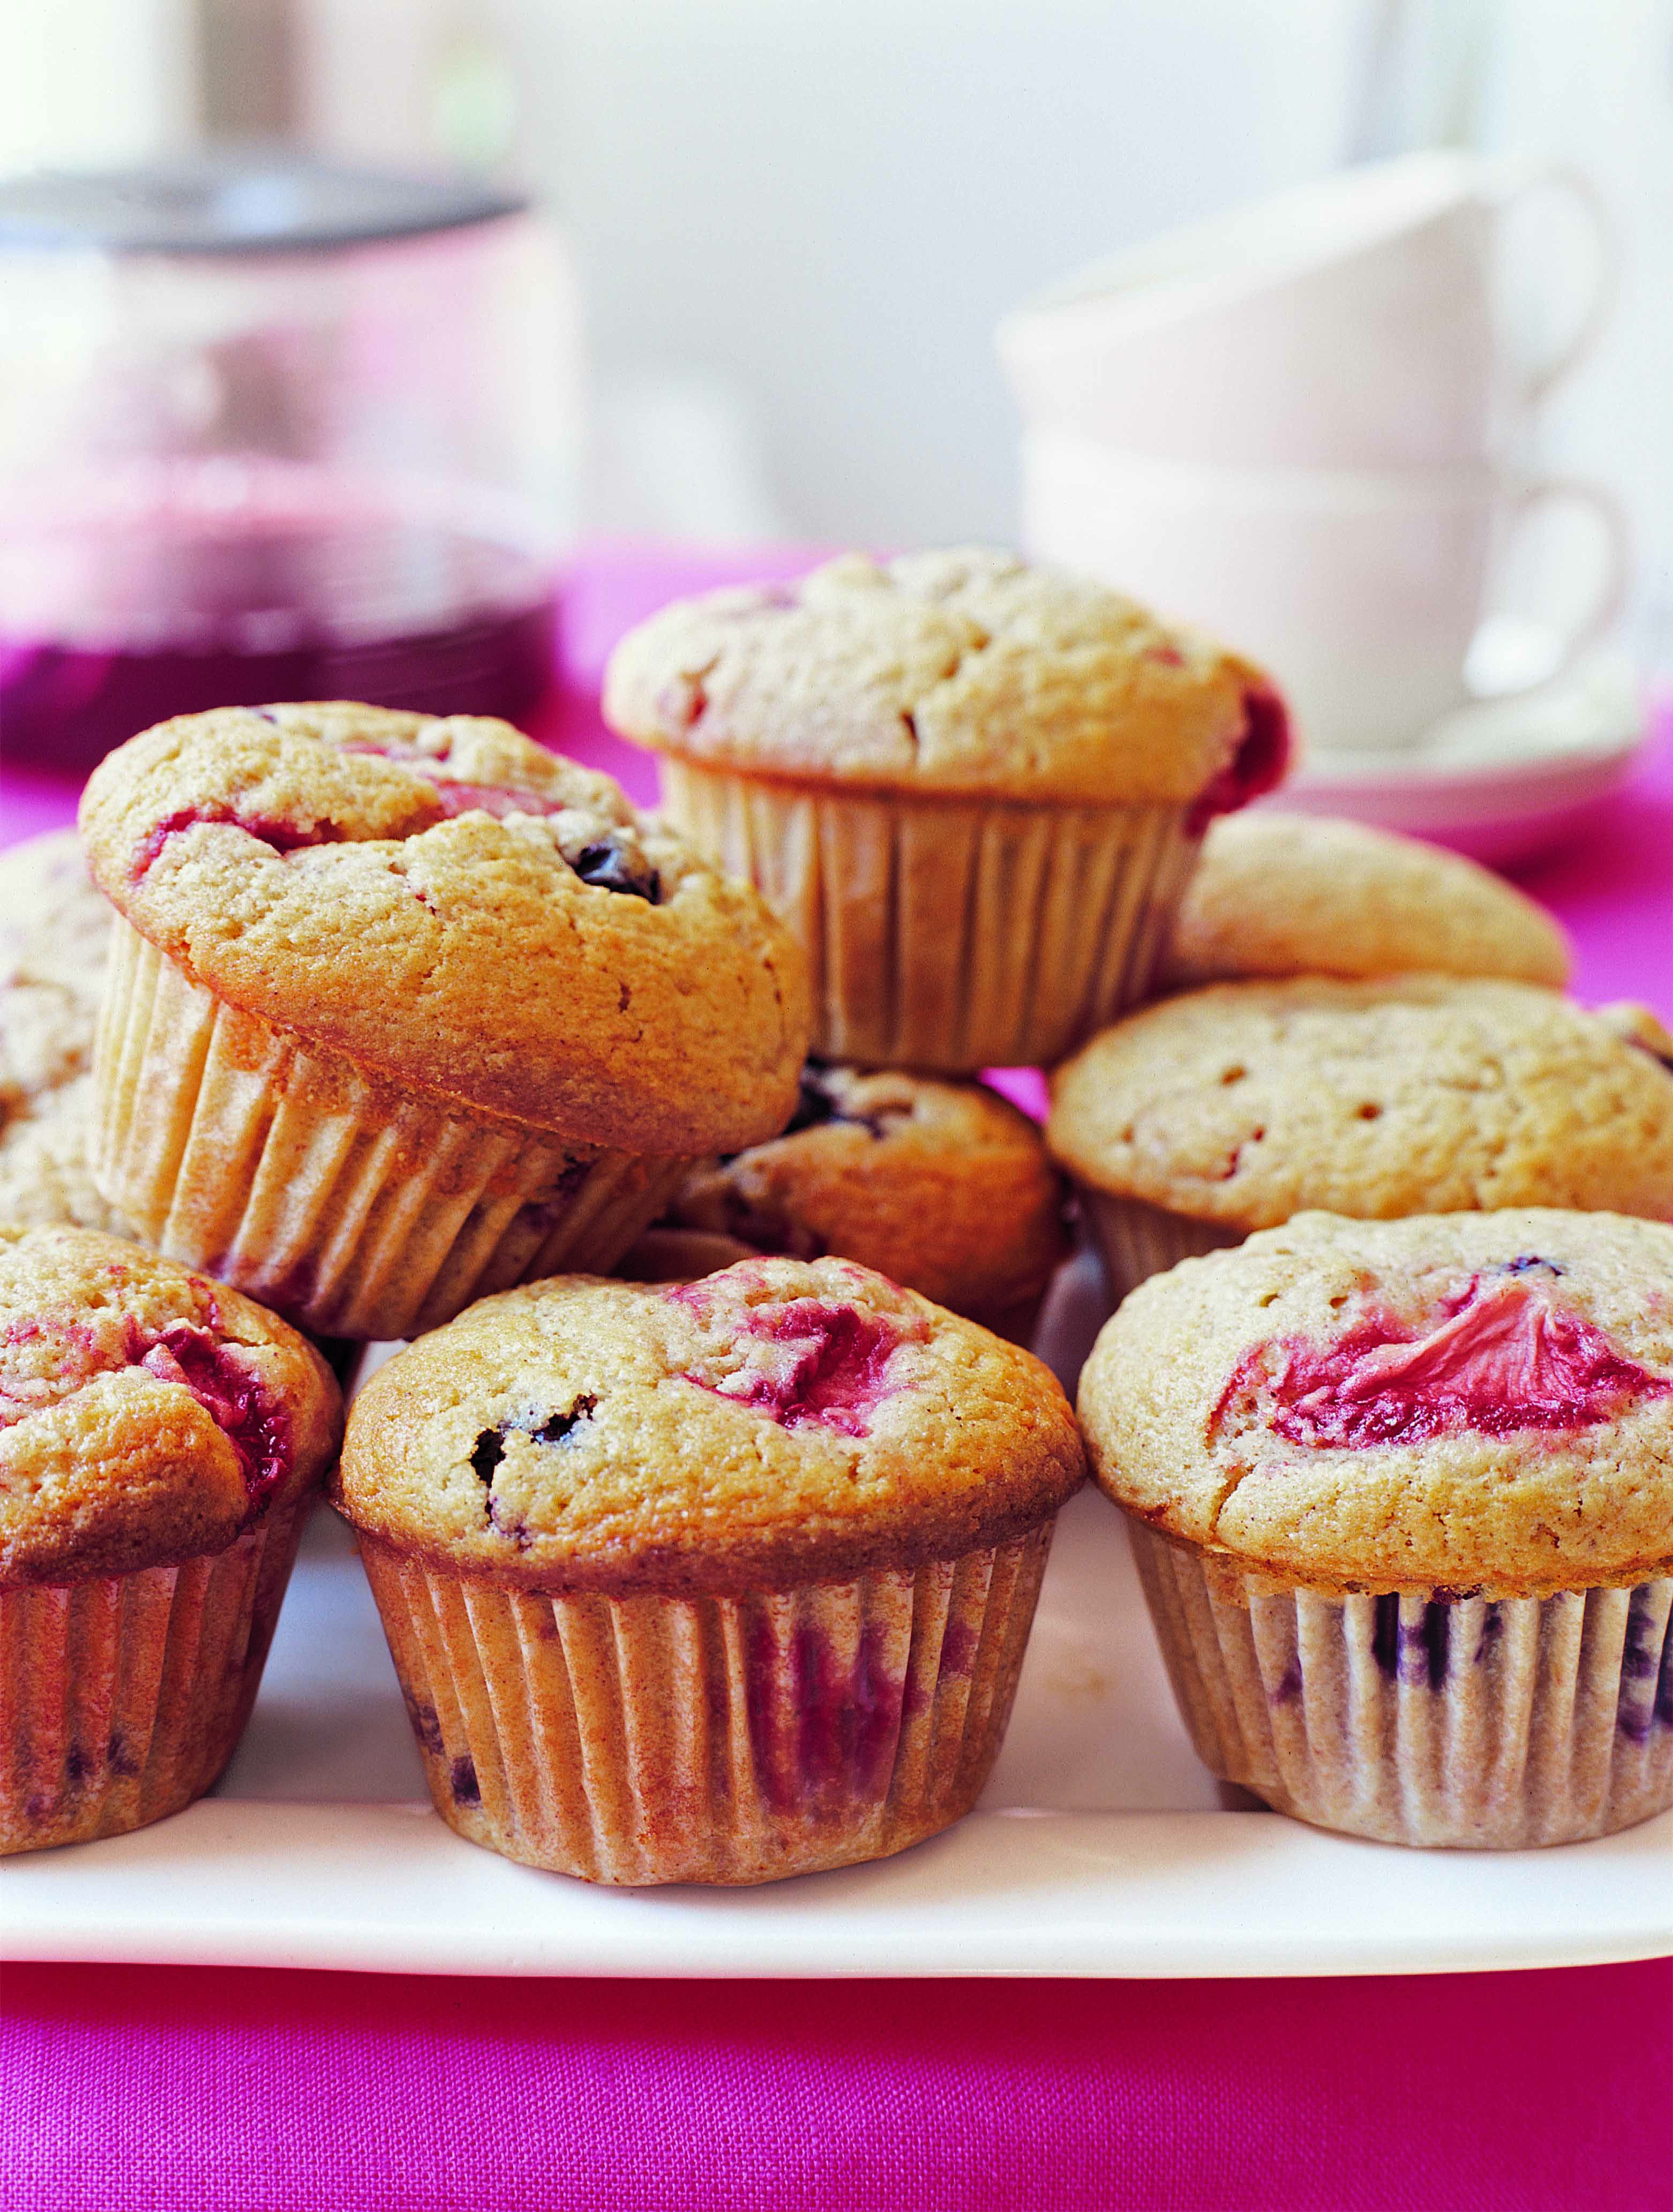 tri- berry muffins | berry muffins and muffin